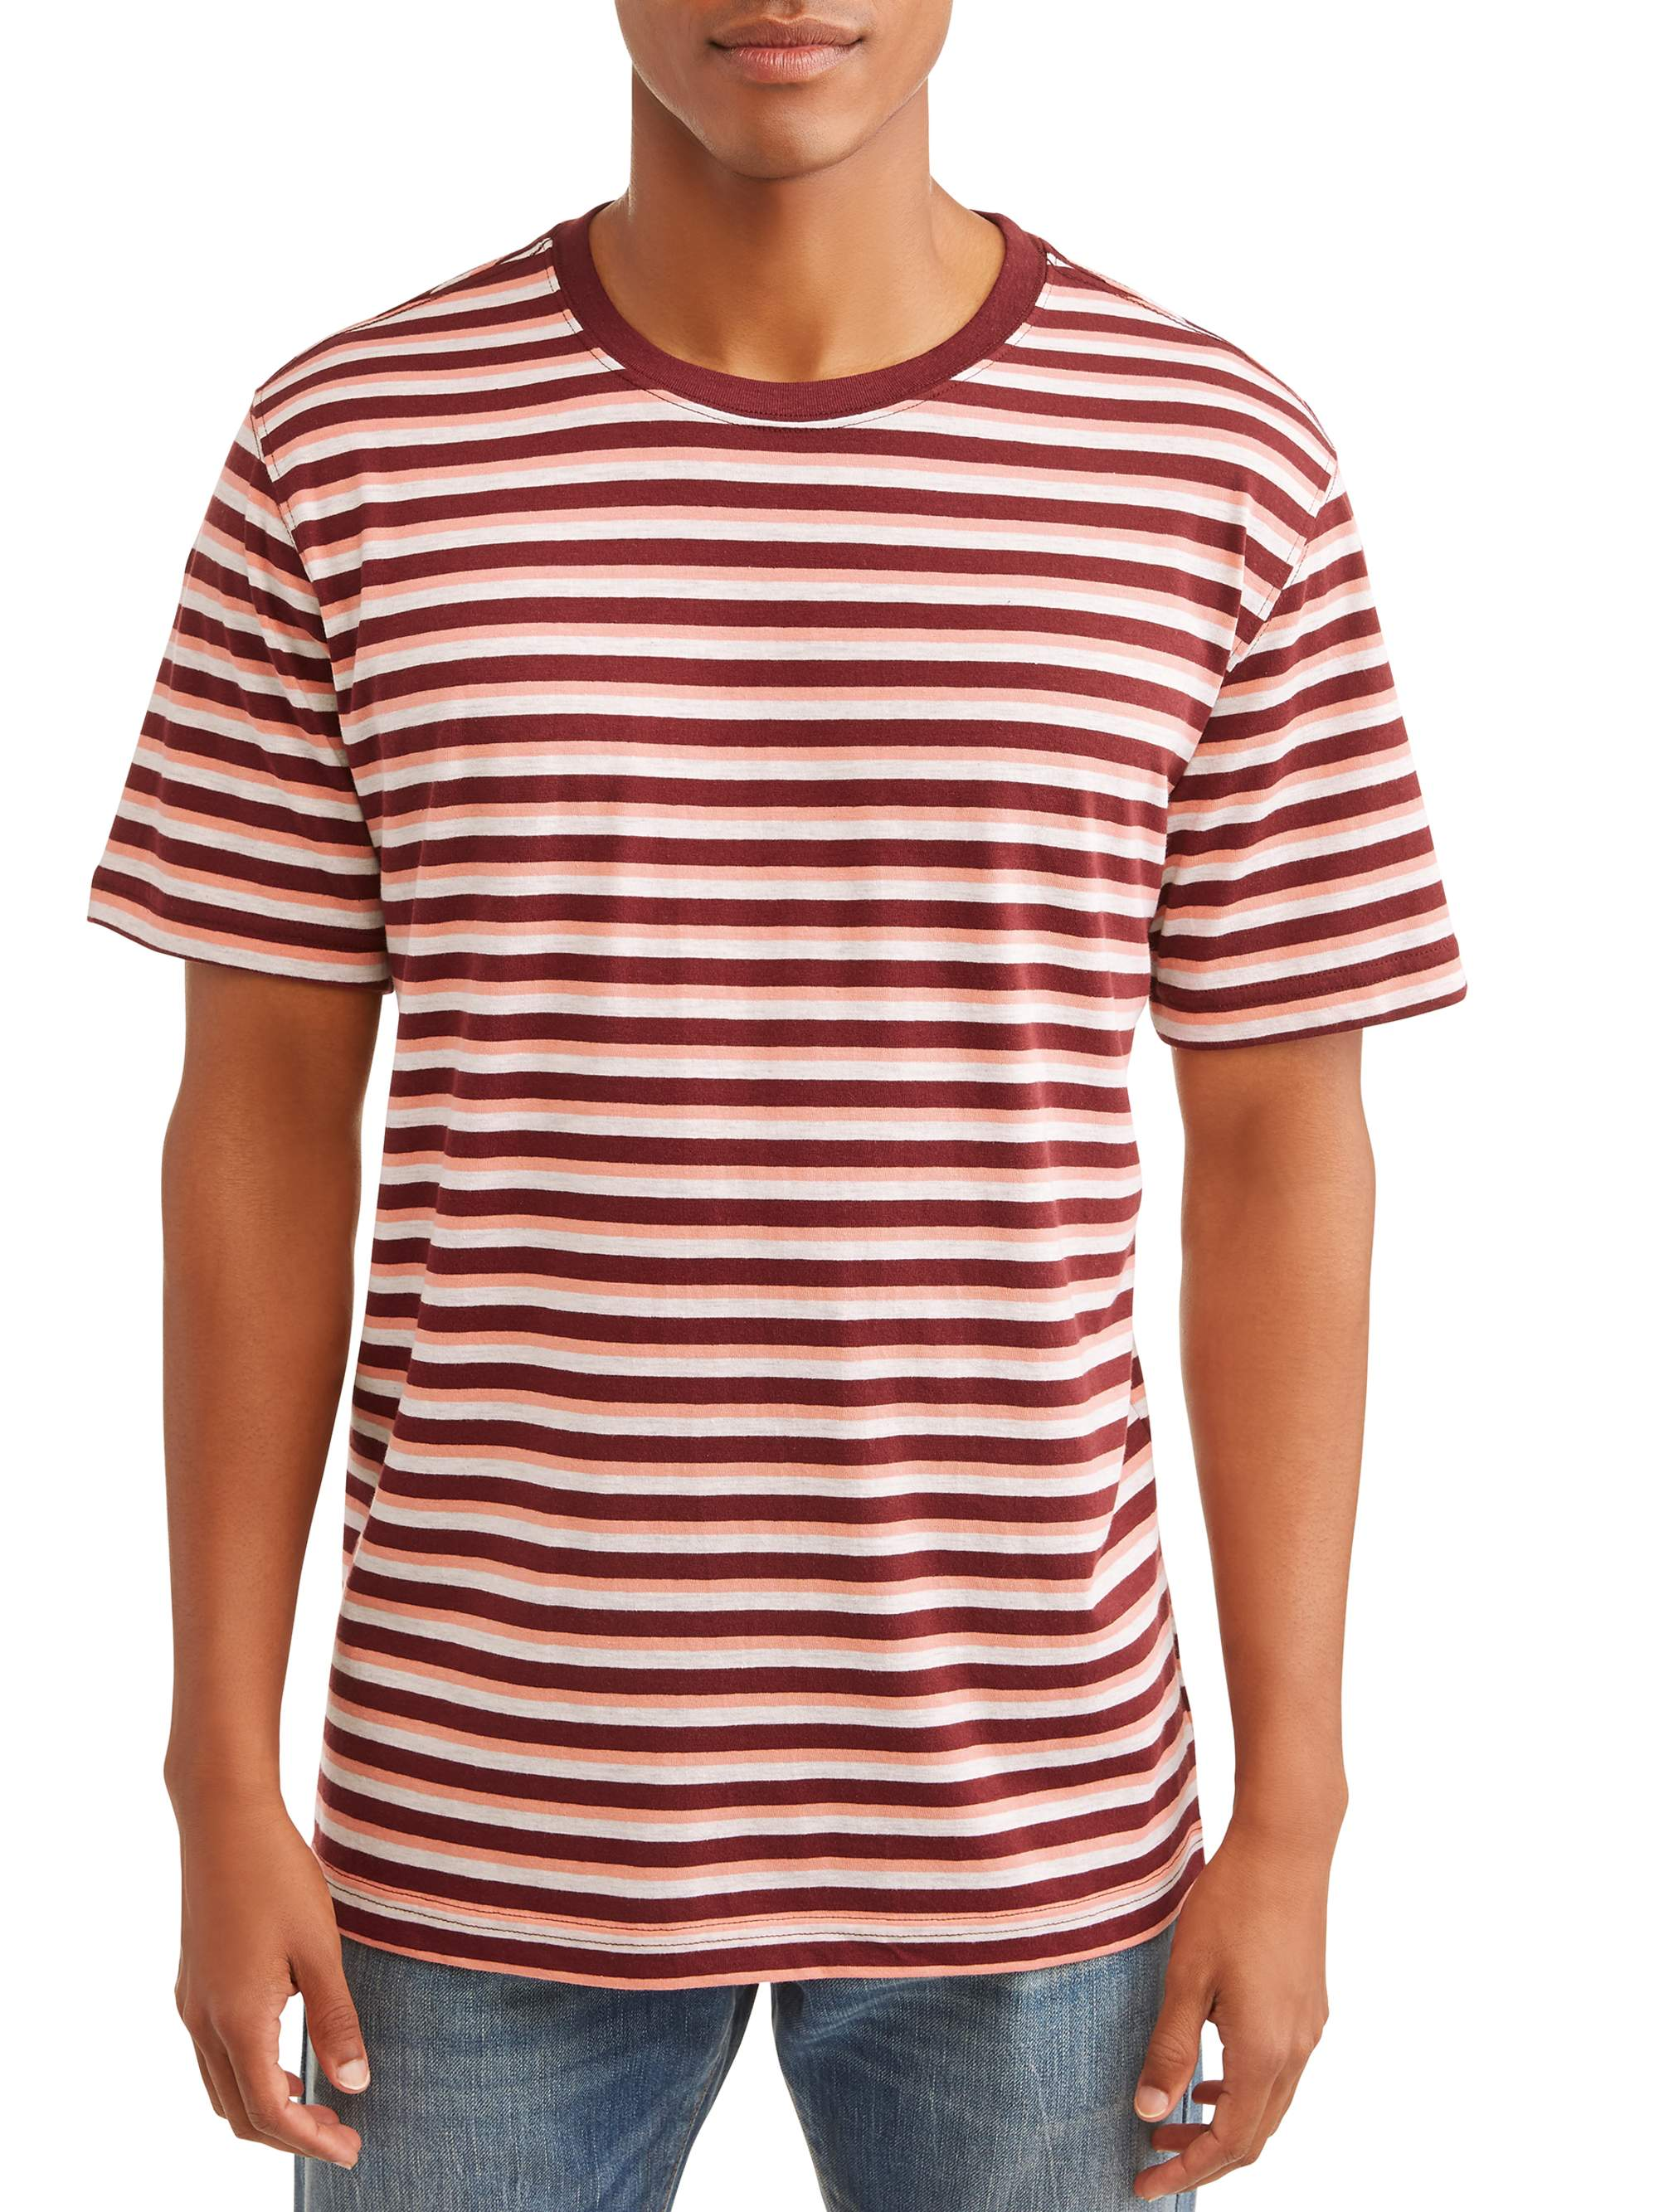 New Under Armour Girls Novelty Logo Short Sleeve Shirt MSRP $24.99 Chose Size